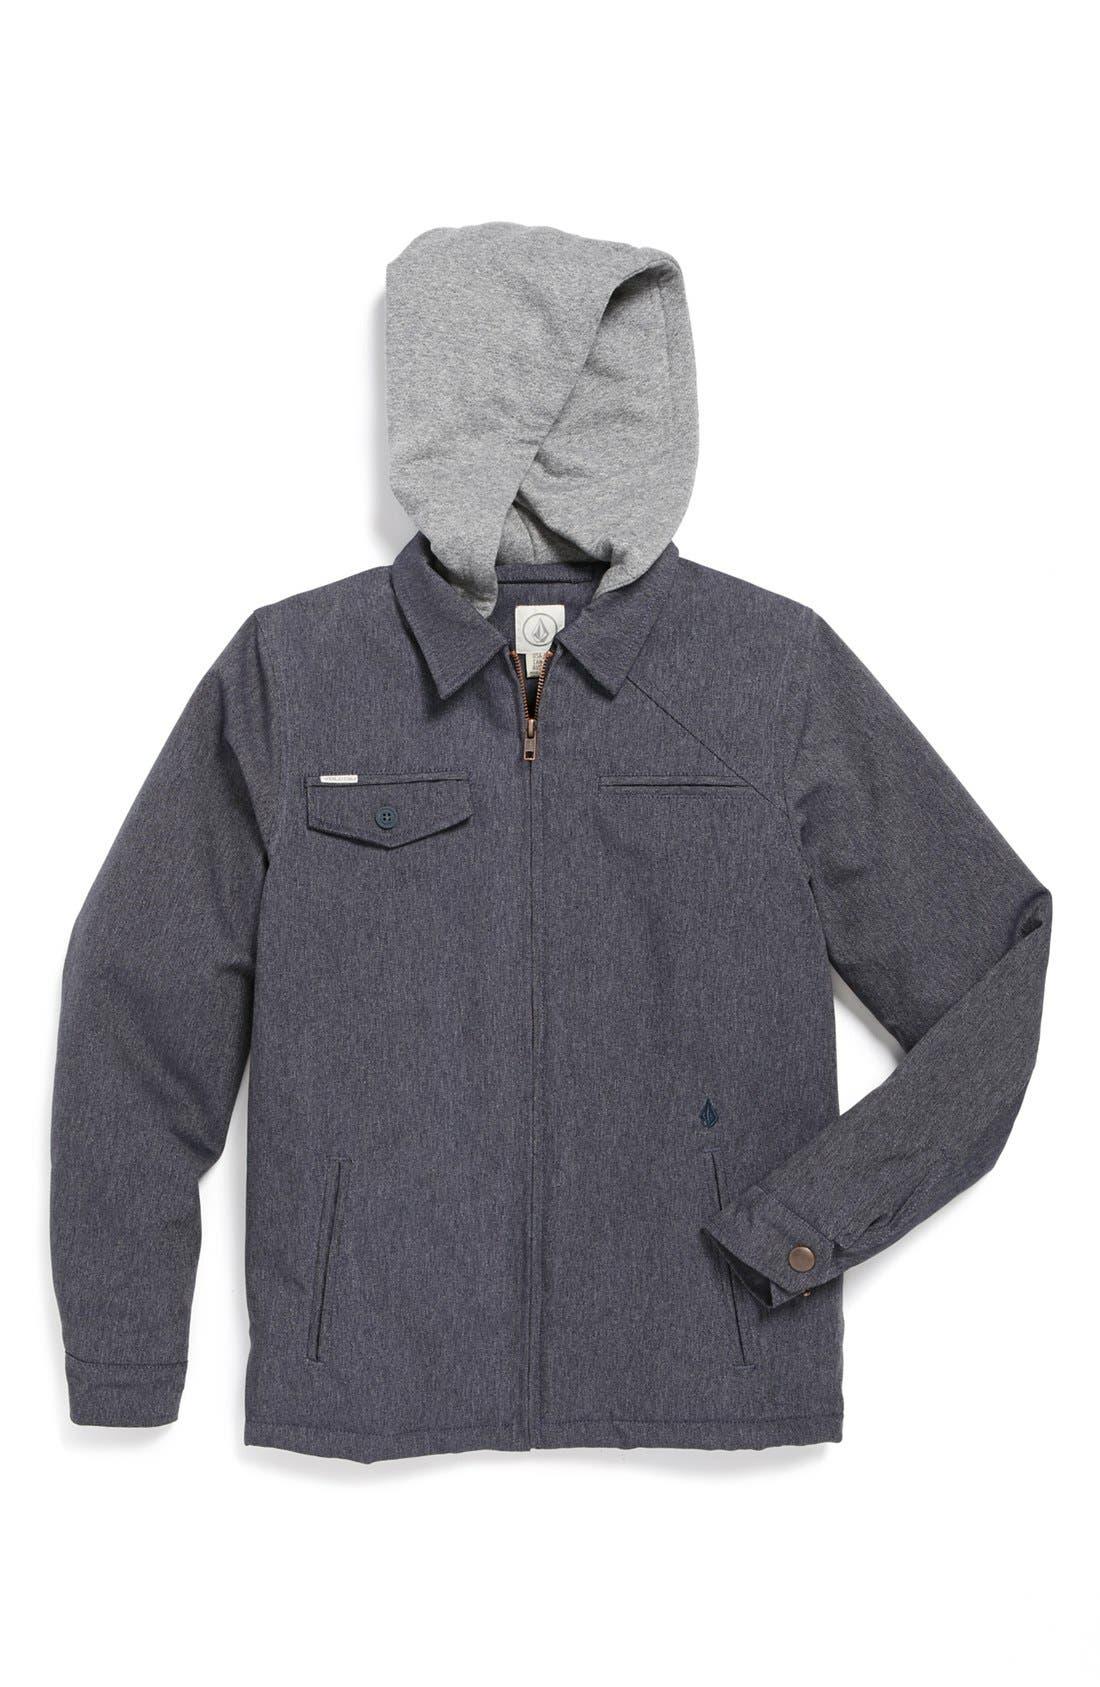 Alternate Image 1 Selected - Volcom Knit Hood Jacket (Big Boys)